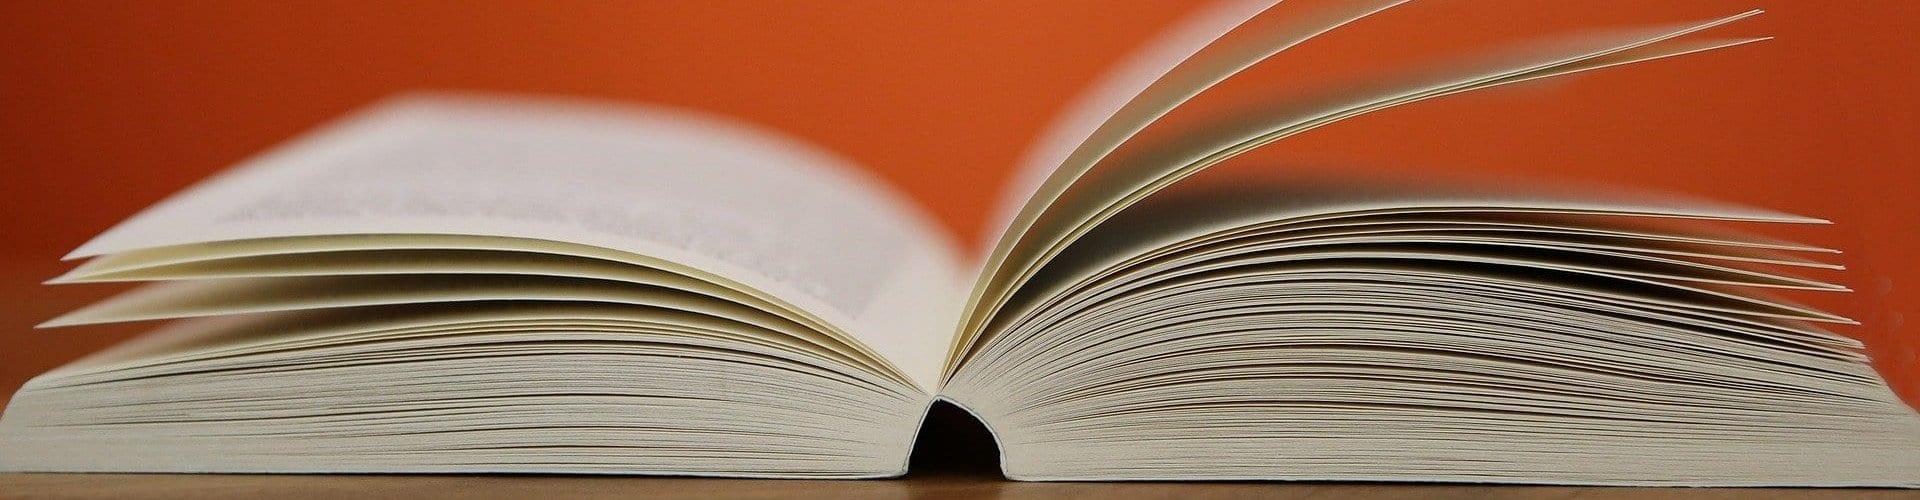 book-408302_1920-aspect-ratio-x